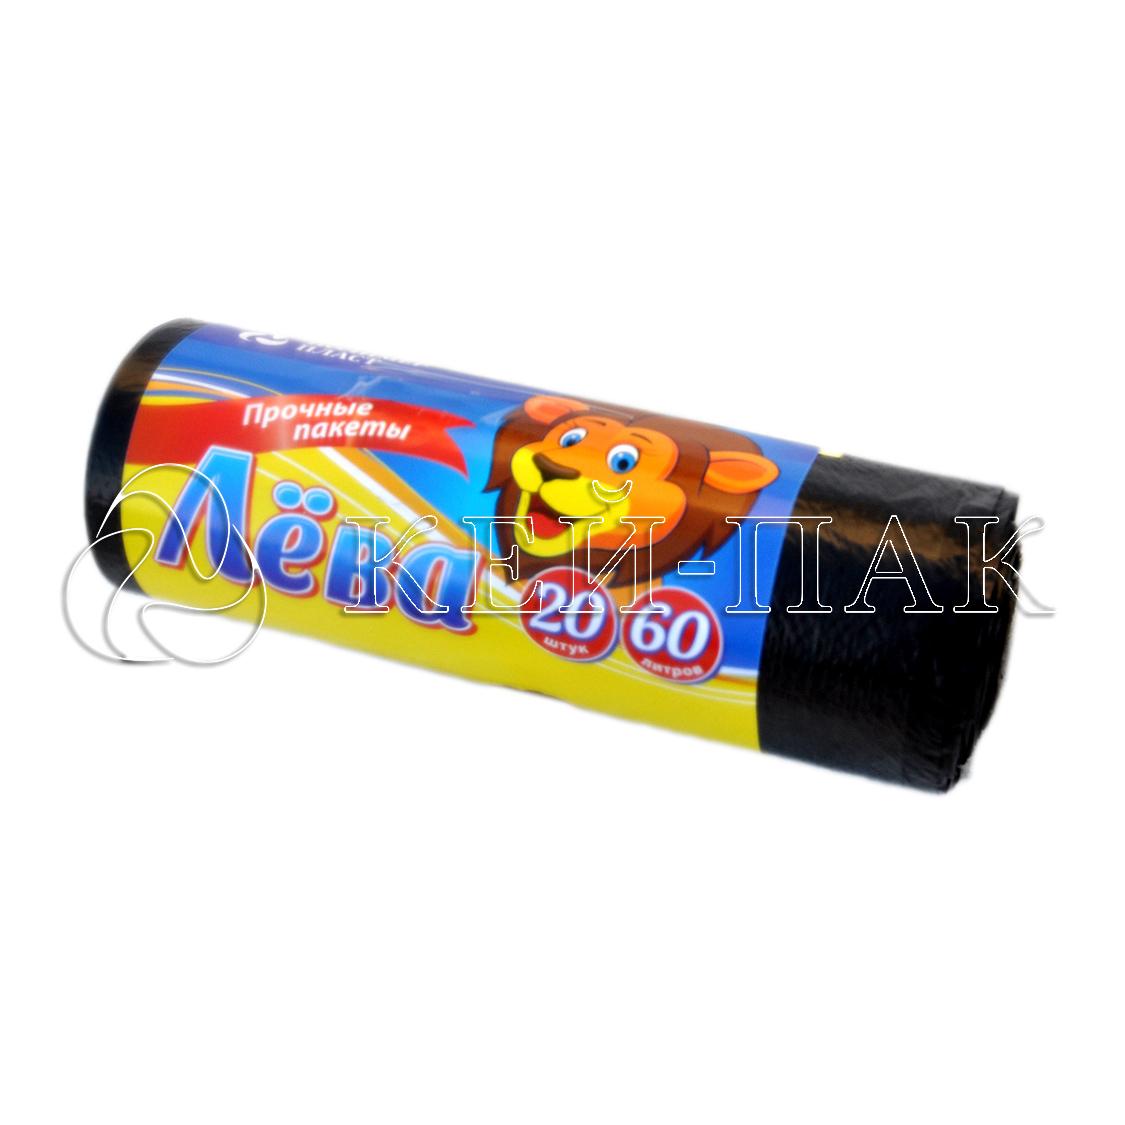 Мешок для мусора «Лёва» 60л, 20 шт. в рулоне.